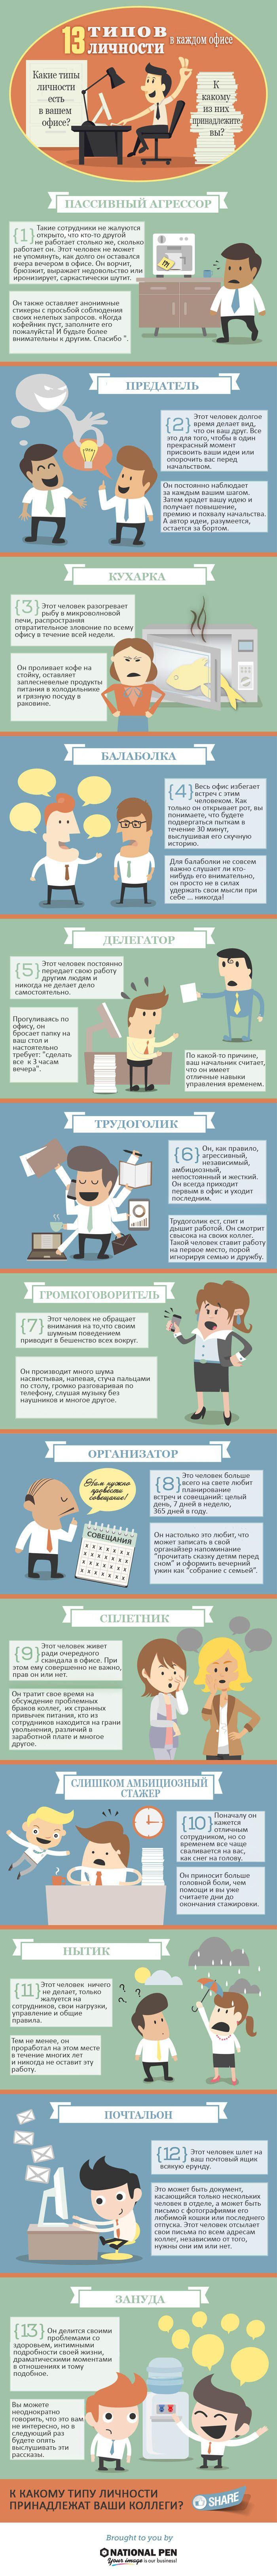 #лайфхак #lifehack  #инфографика #infographics #работа #офис #job #office